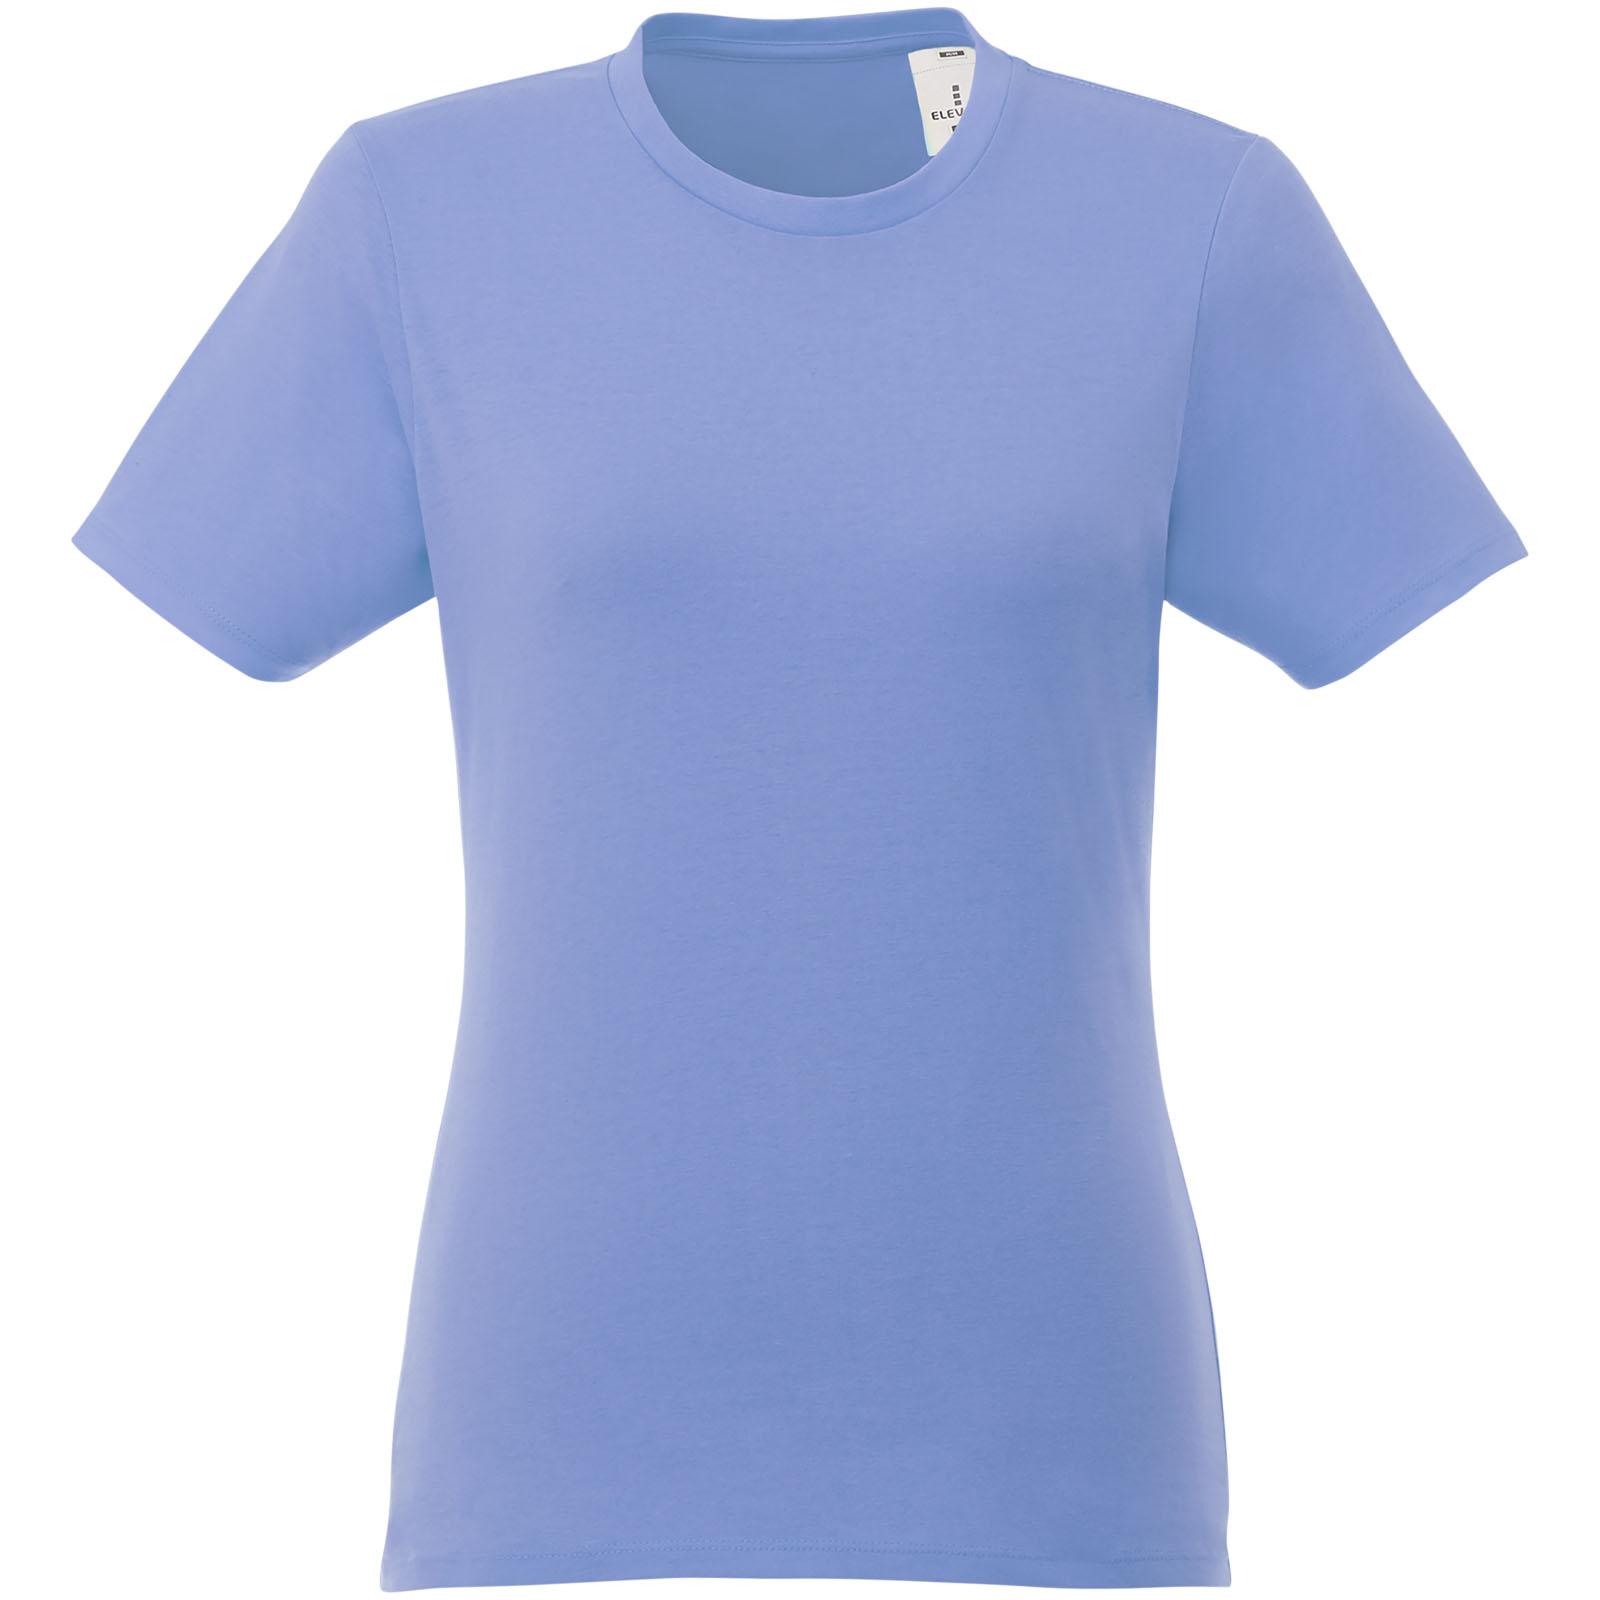 Heros short sleeve women's t-shirt